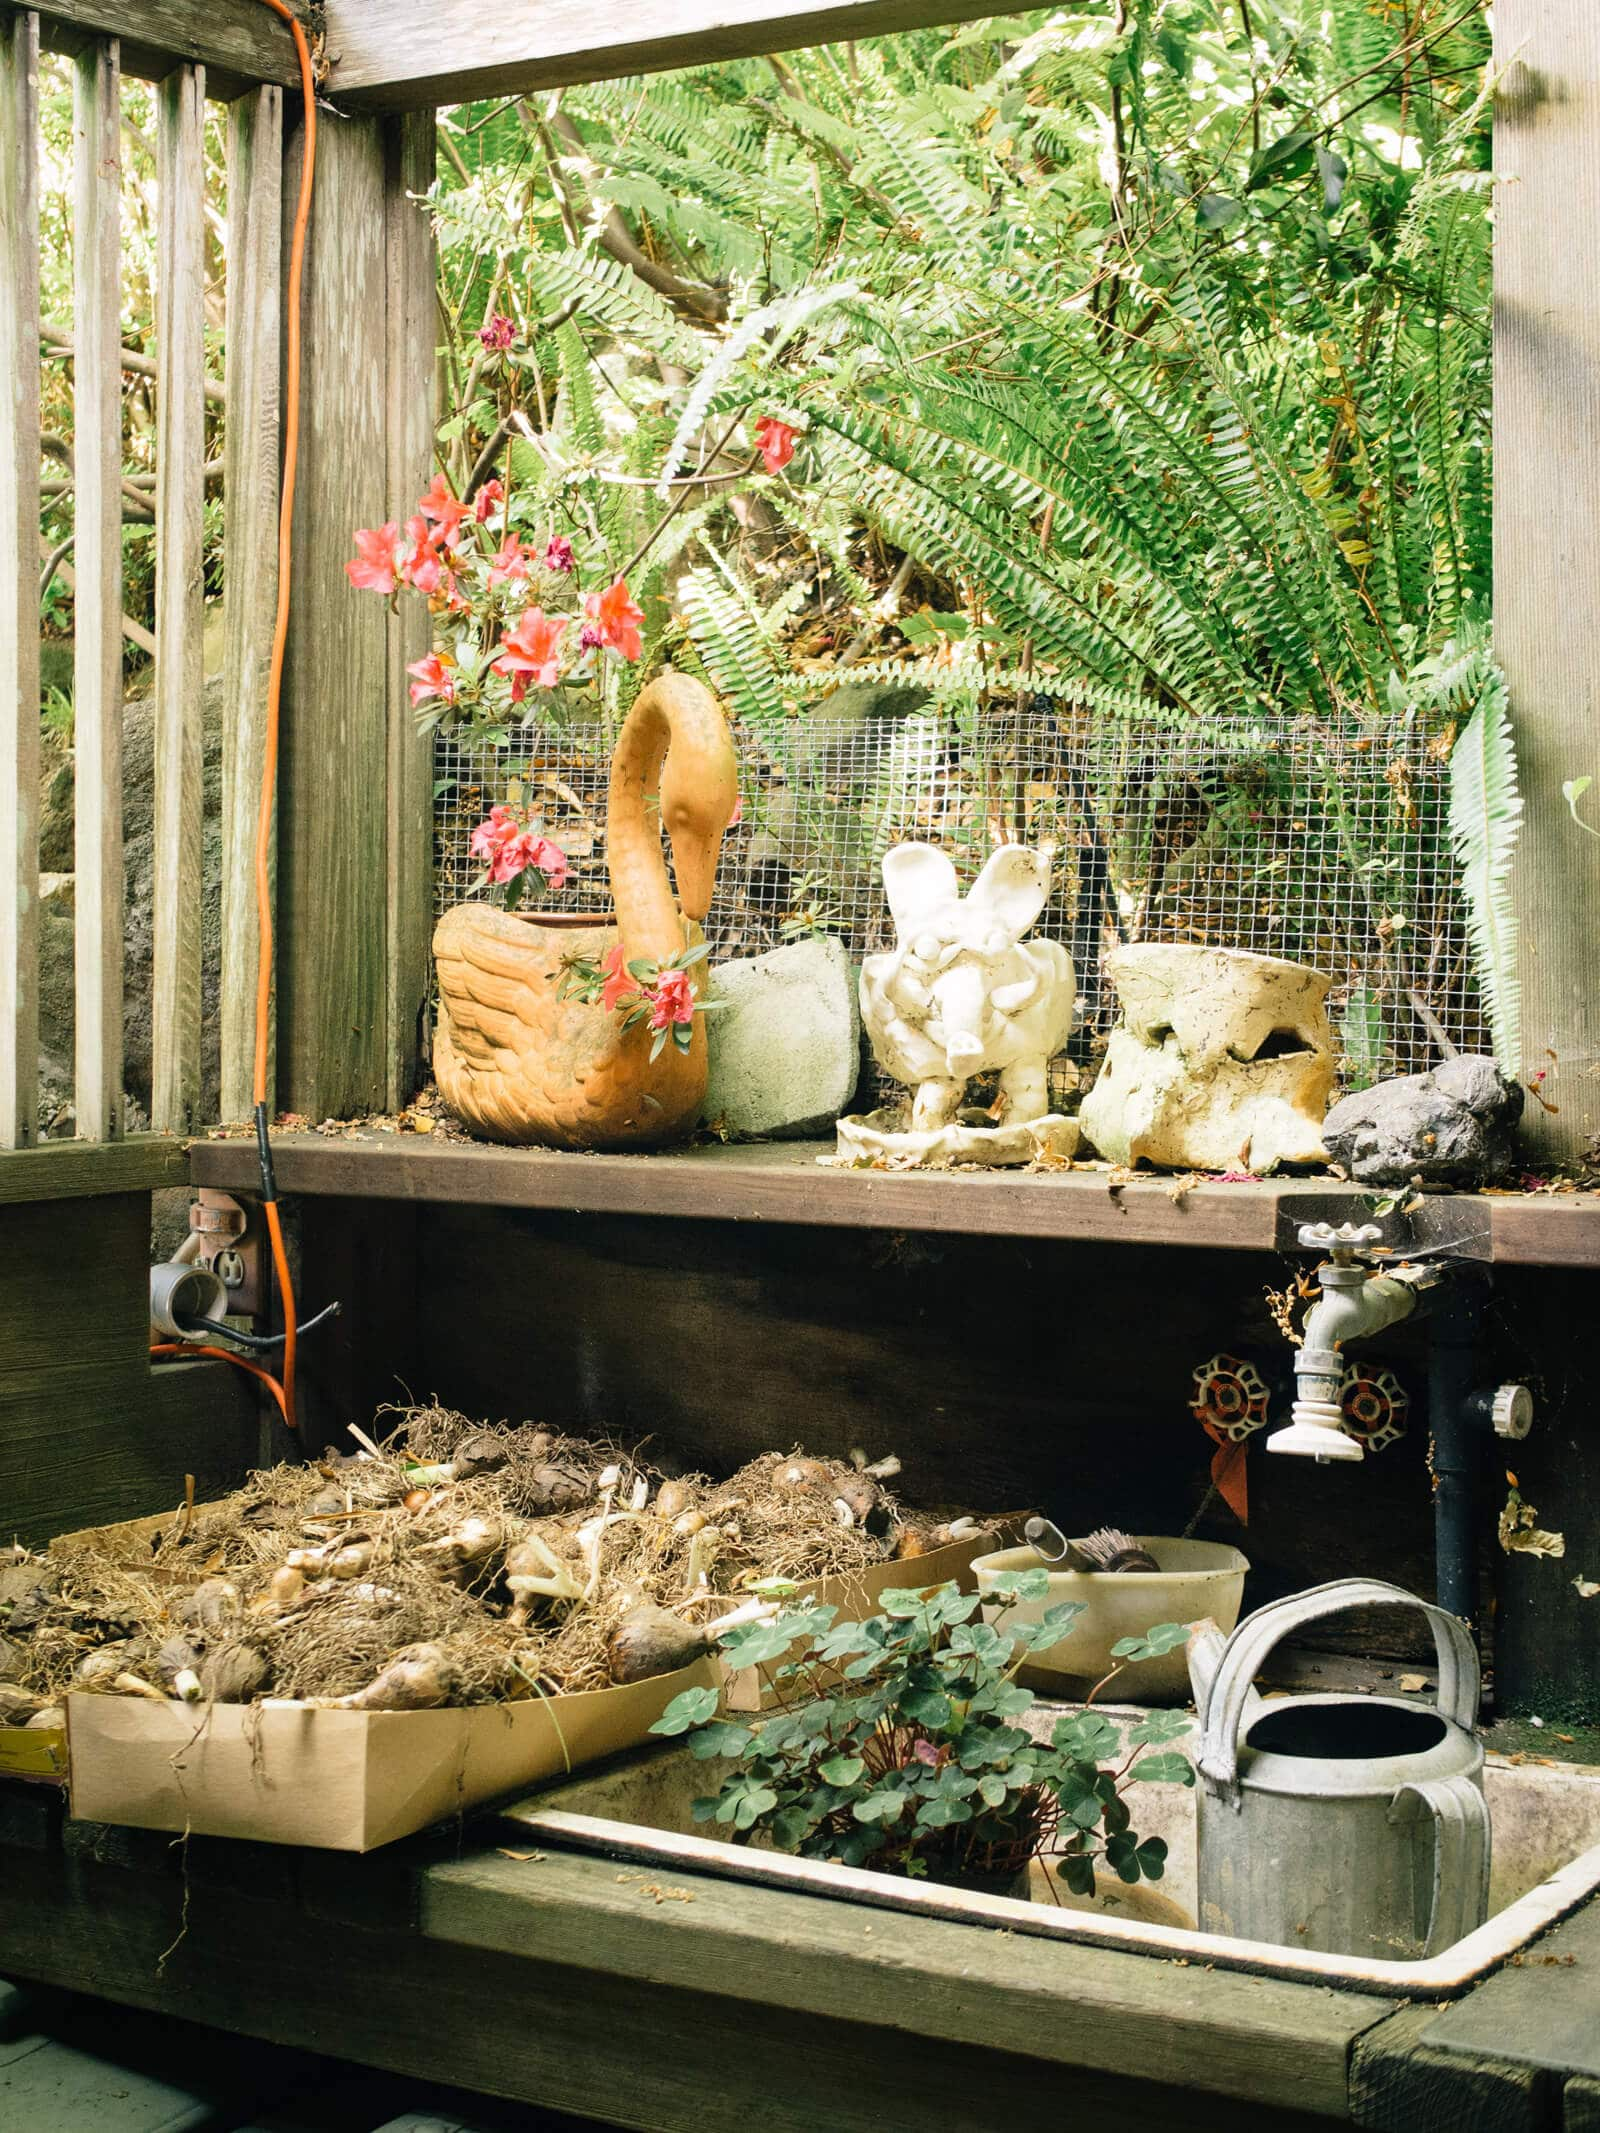 A fall garden checklist for maximizing the season and winterizing your yard